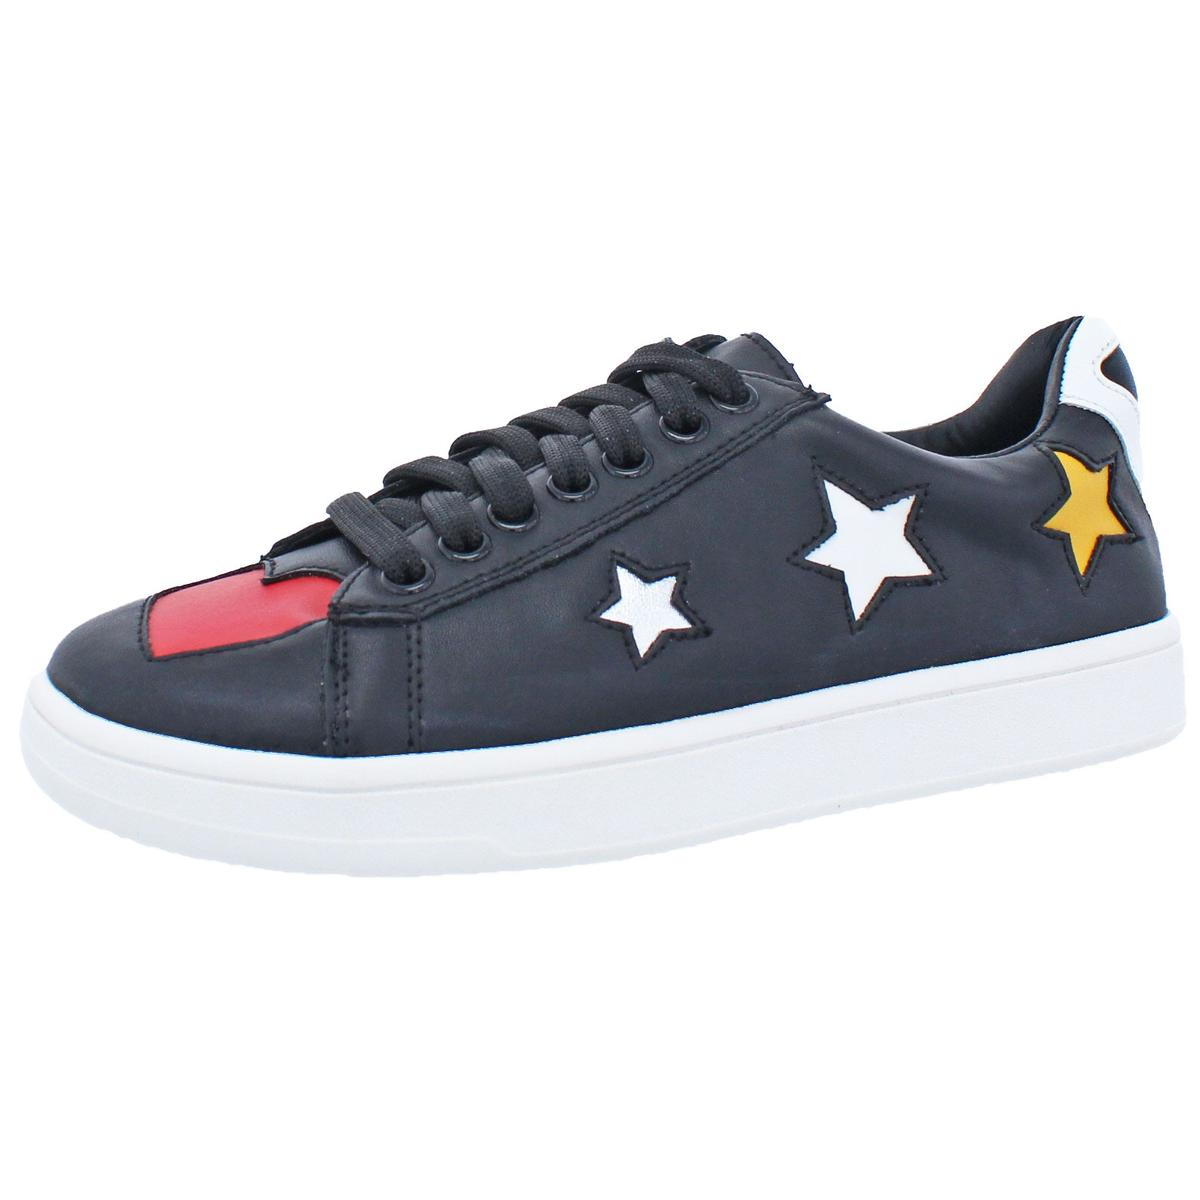 63c947c34f8 Details about Steve Madden Womens Limit Black Fashion Sneakers Shoes 9  Medium (B